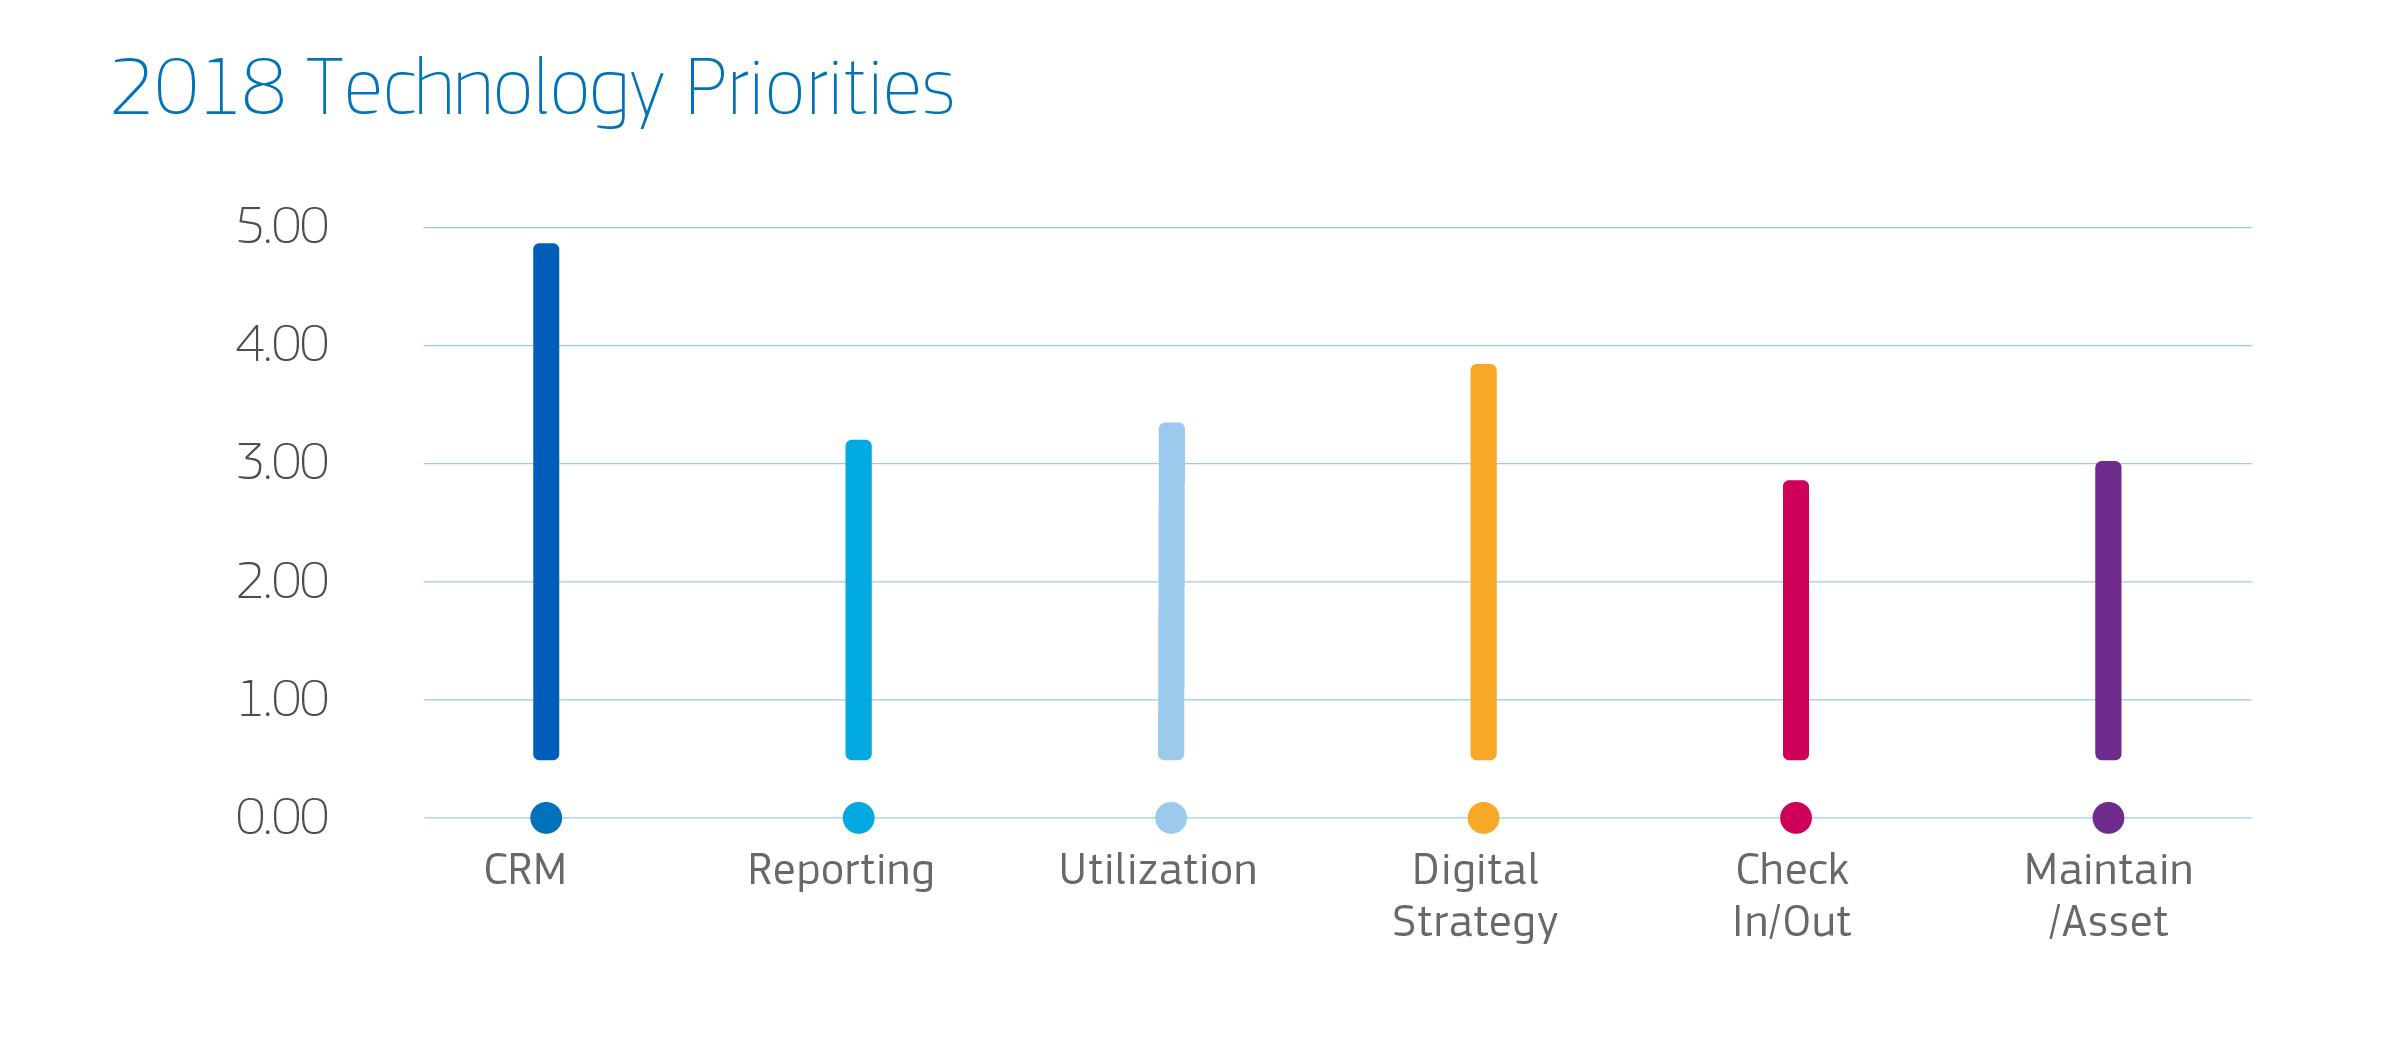 2018 Technology Priorities